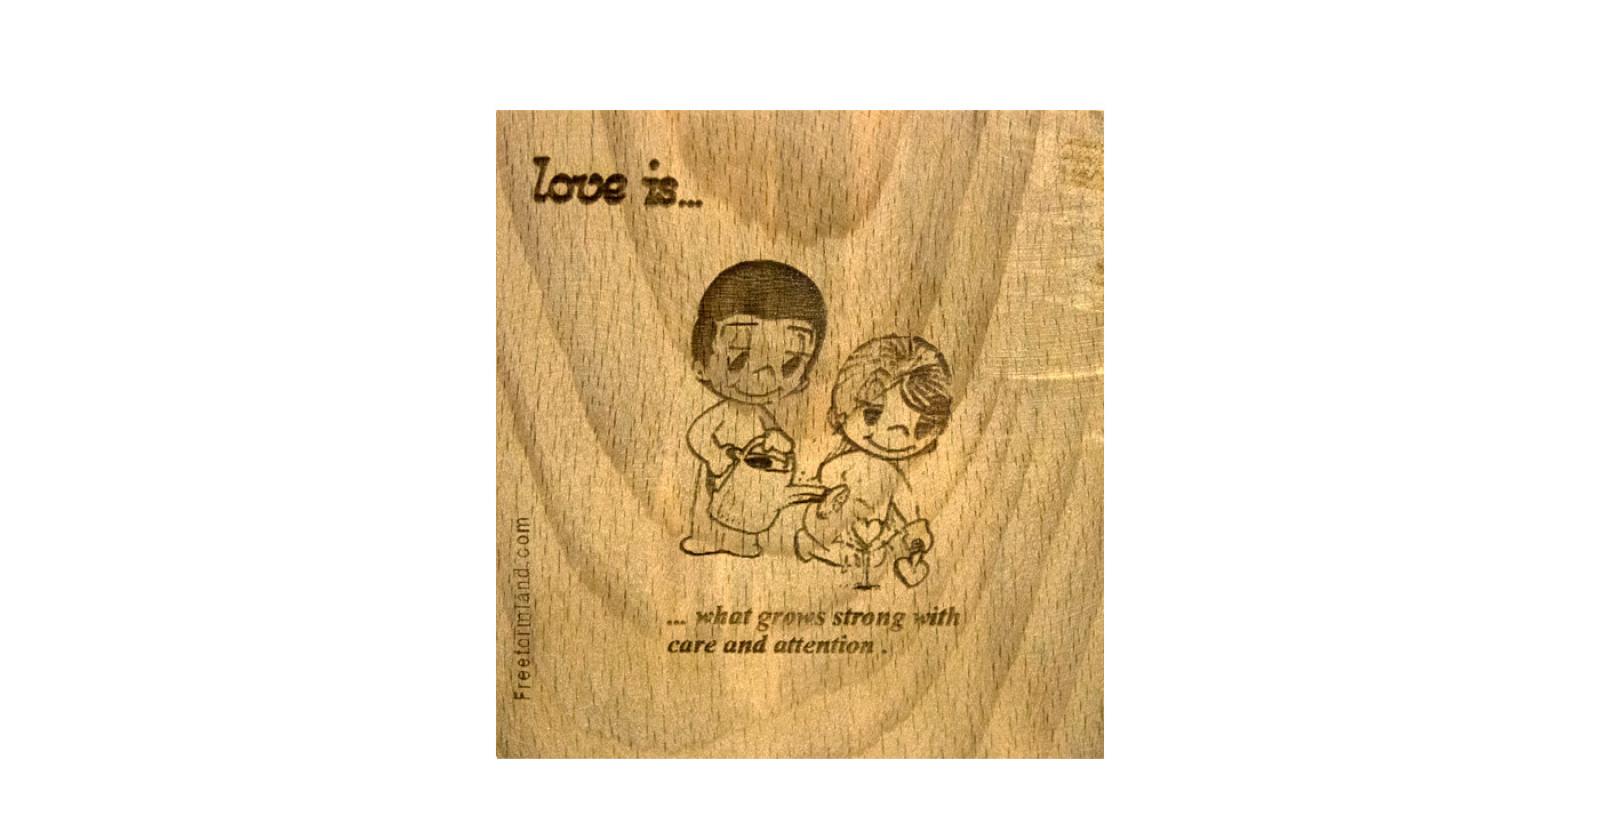 طرح 12 --- love is چوب نبشته